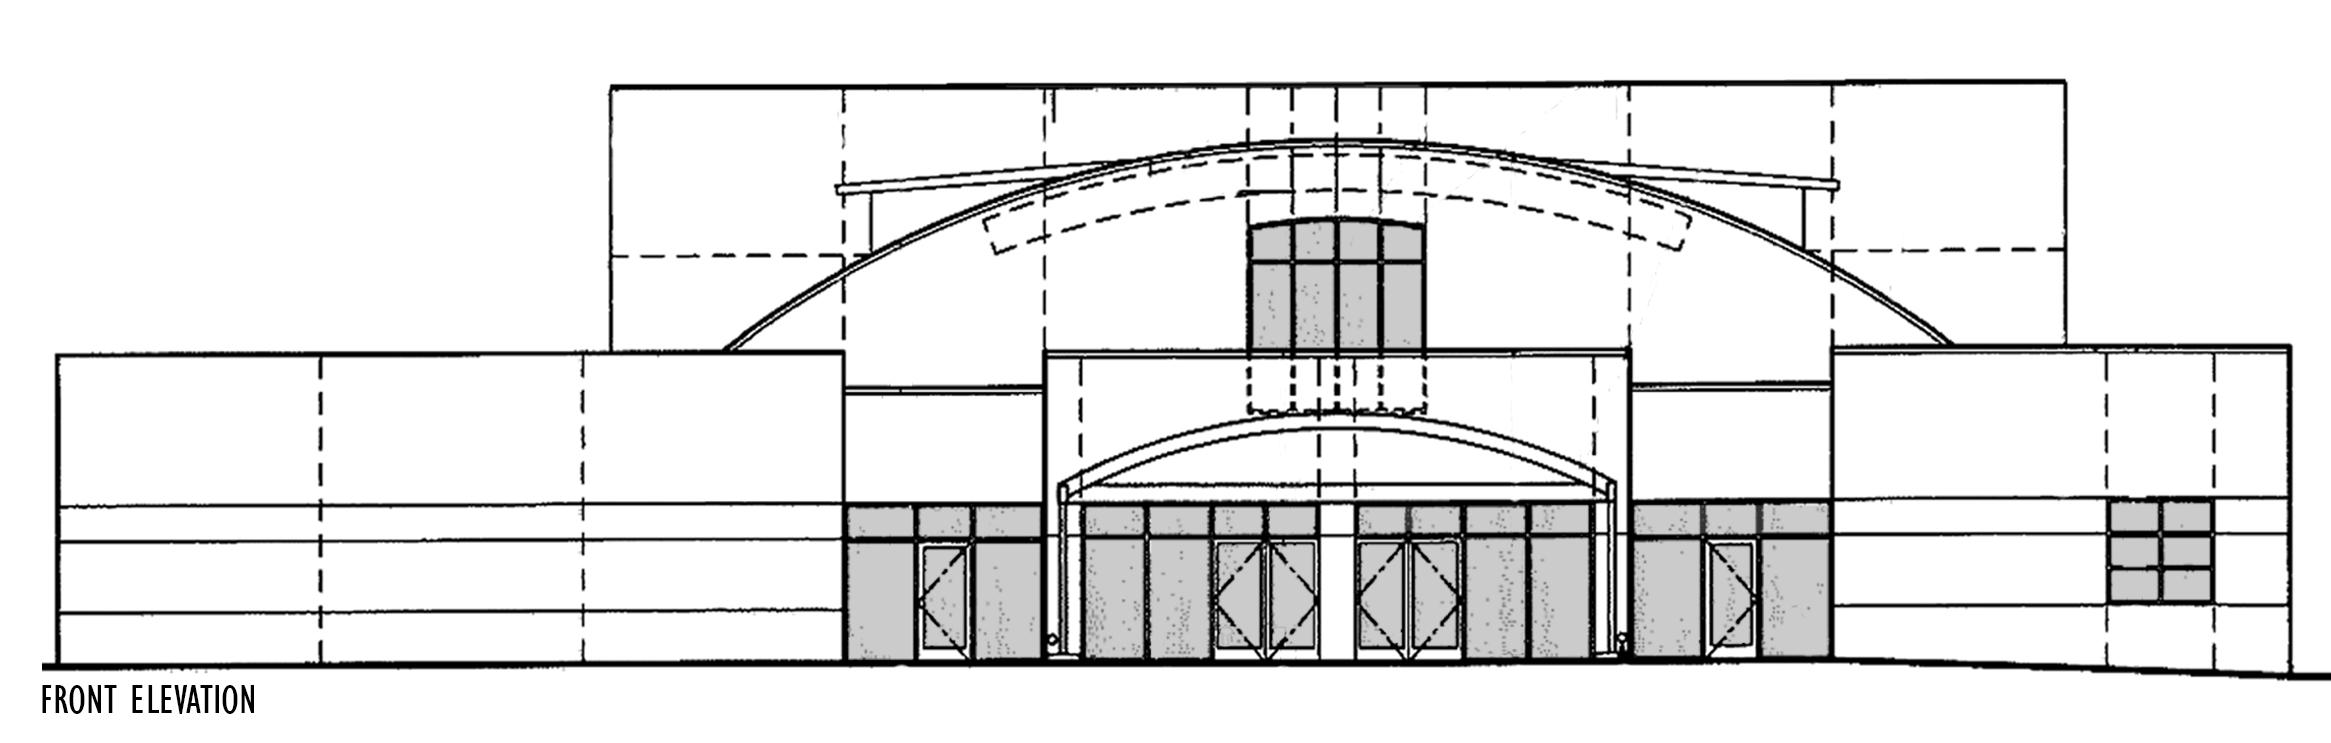 Crenshaw Christian Center Expansion.jpg